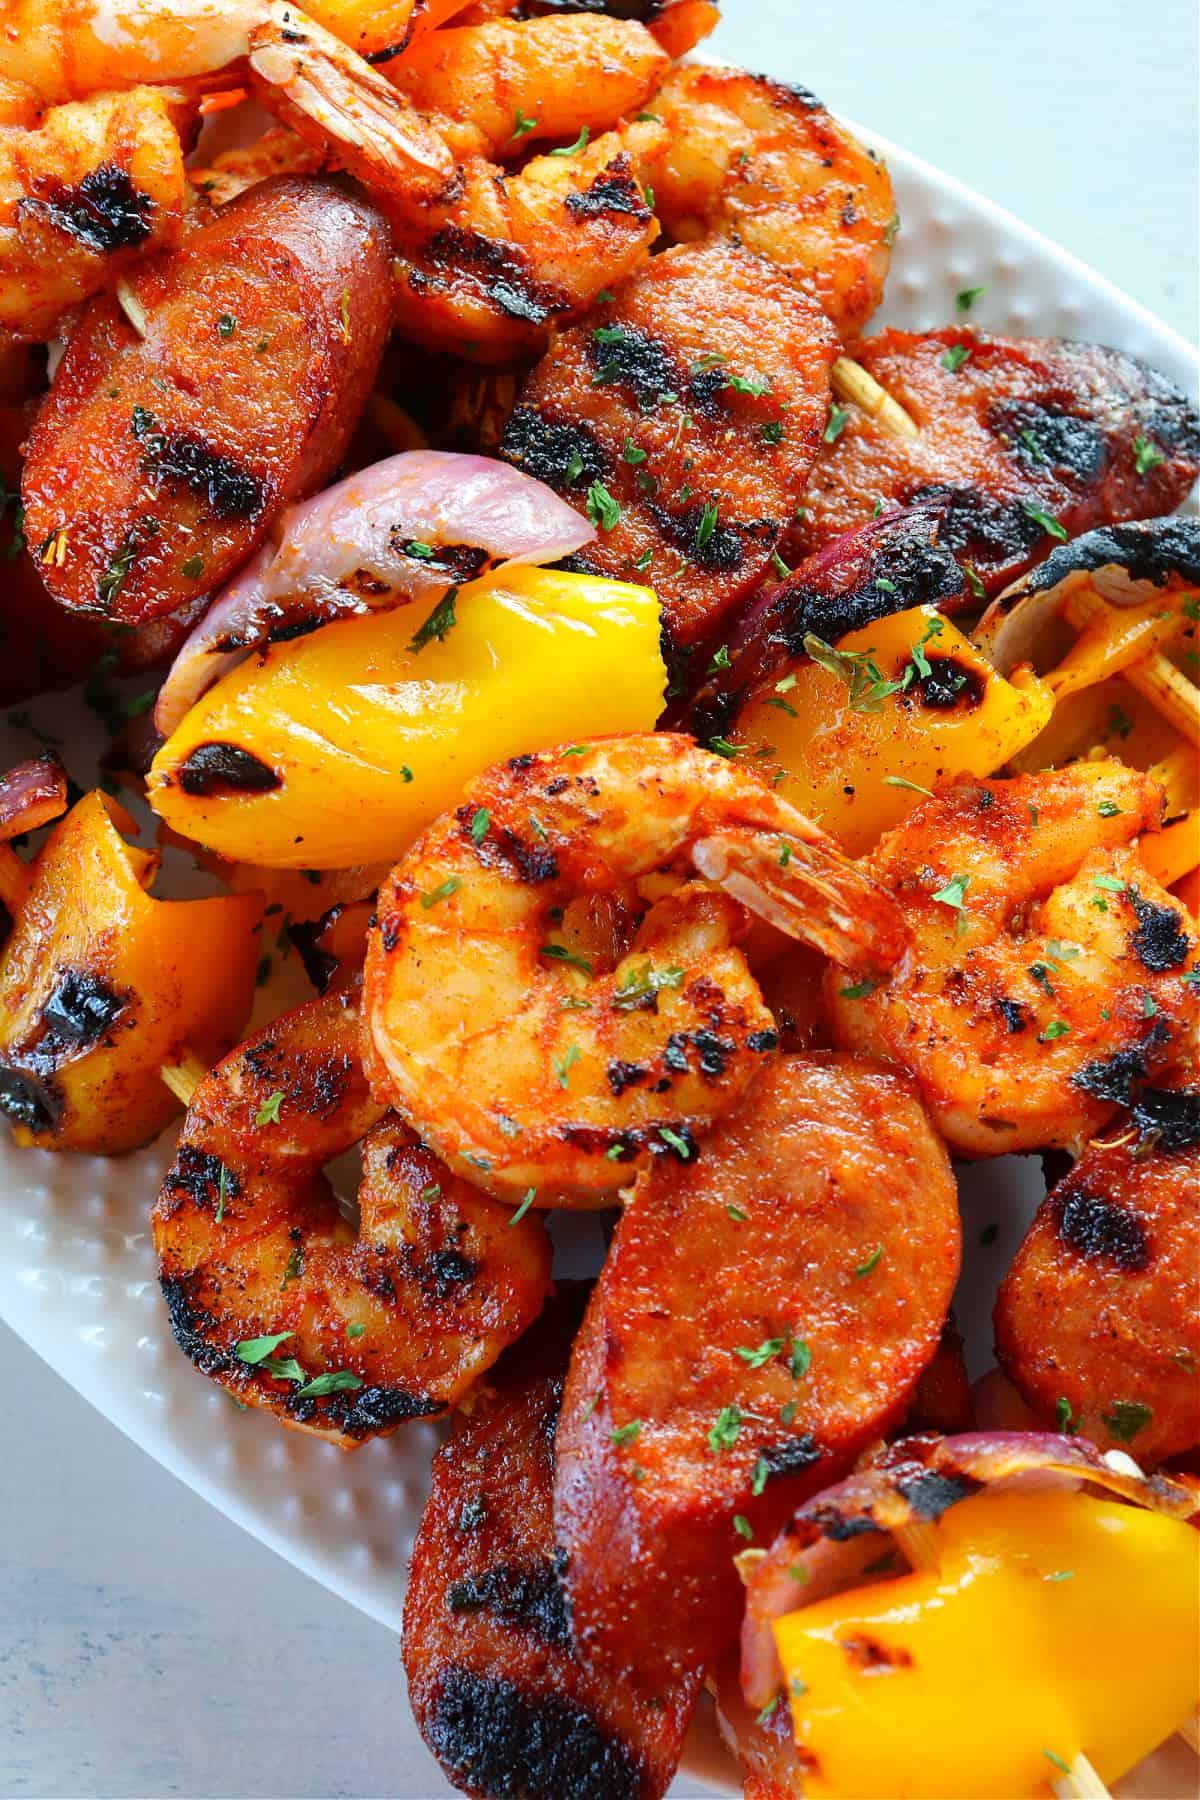 shrimp and sausage skewers 1 Shrimp and Sausage Skewers (Keto Friendly)